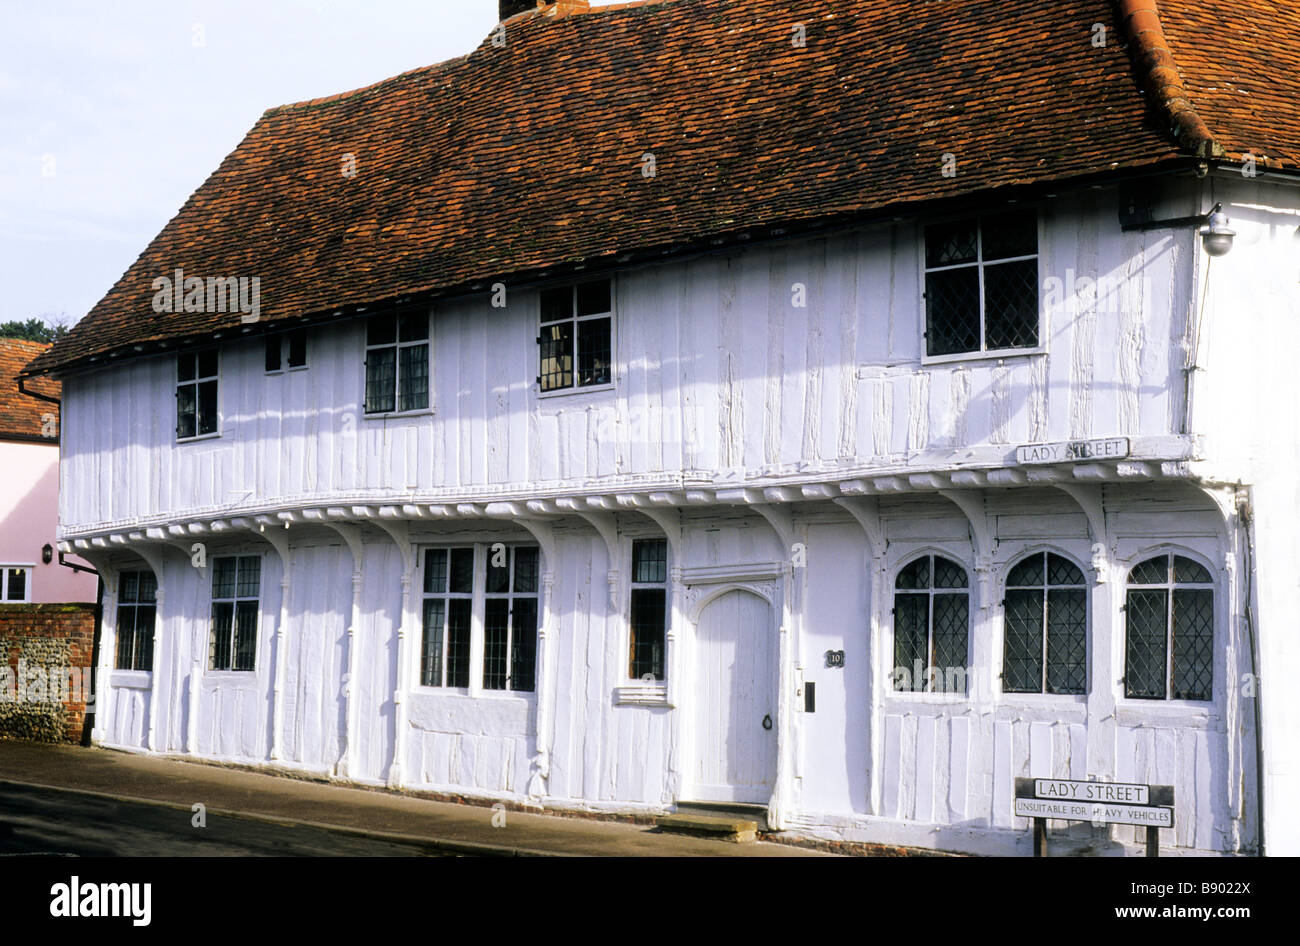 Lime washed timbered house Lady Street Lavenham charm quaint charming old English domestic architecture white Tudor - Stock Image